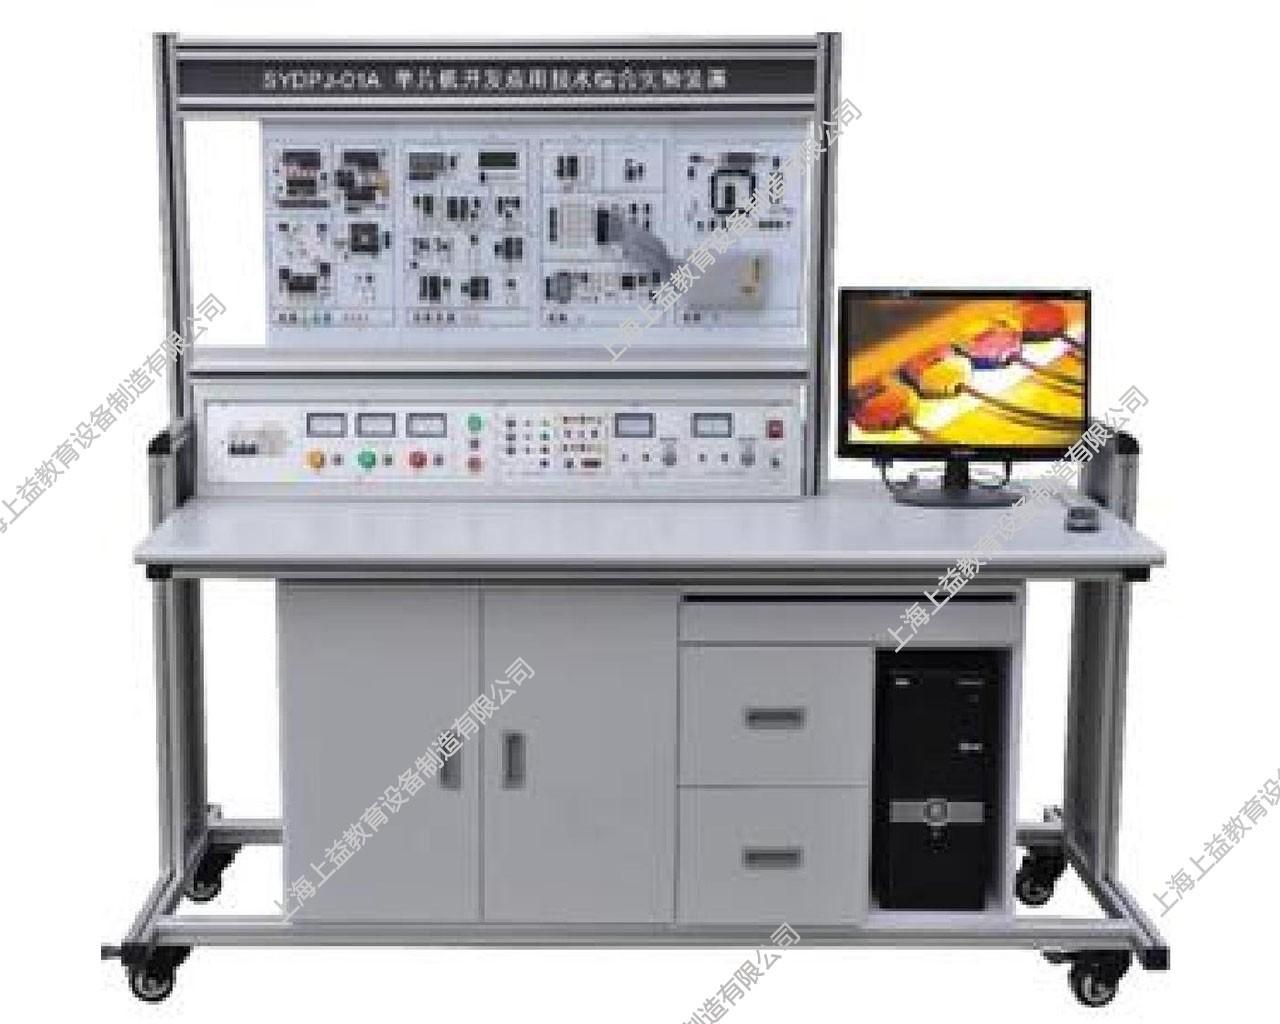 SYDPX-238 单片机技术应用wwwlehu8viplehu68vip装置